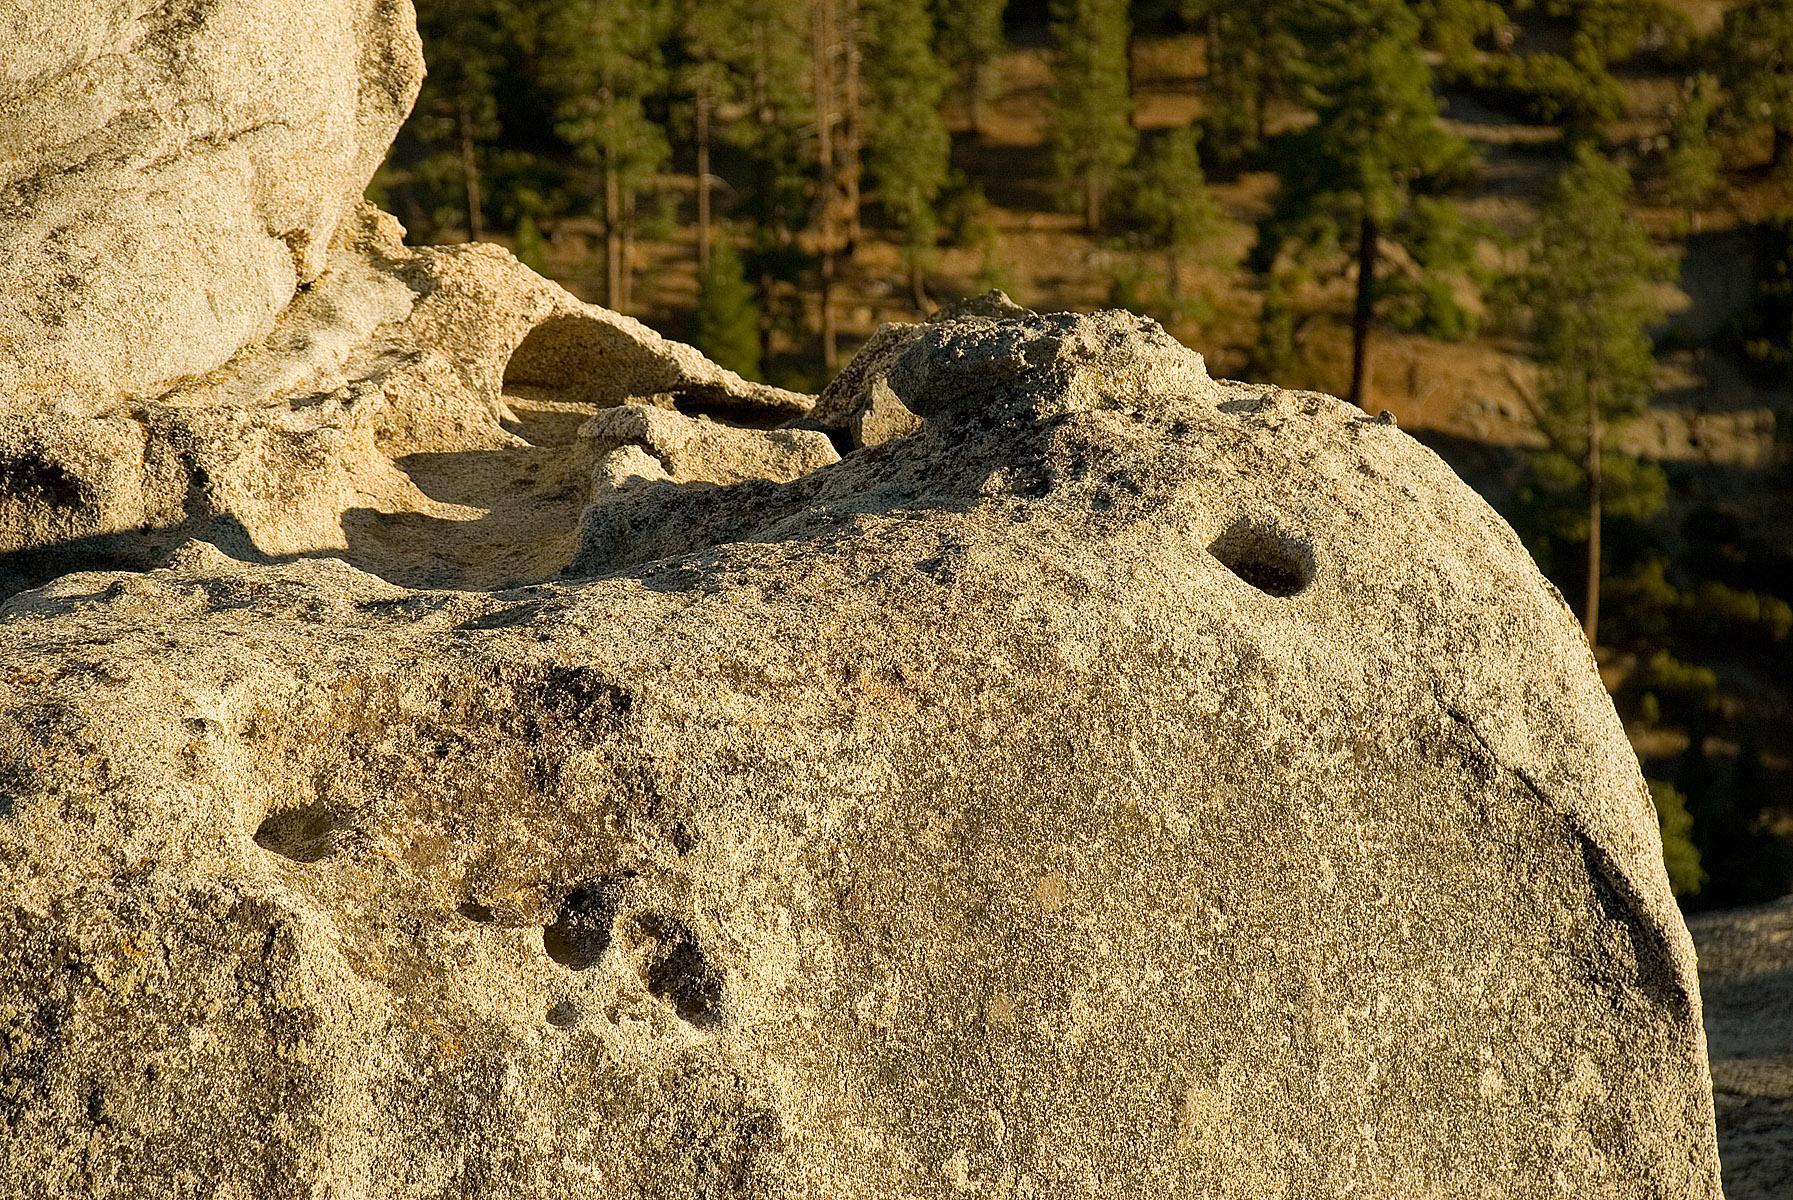 Granite of Ages, Boulder, Bspo06, Erosion, Forest, HQ Photo